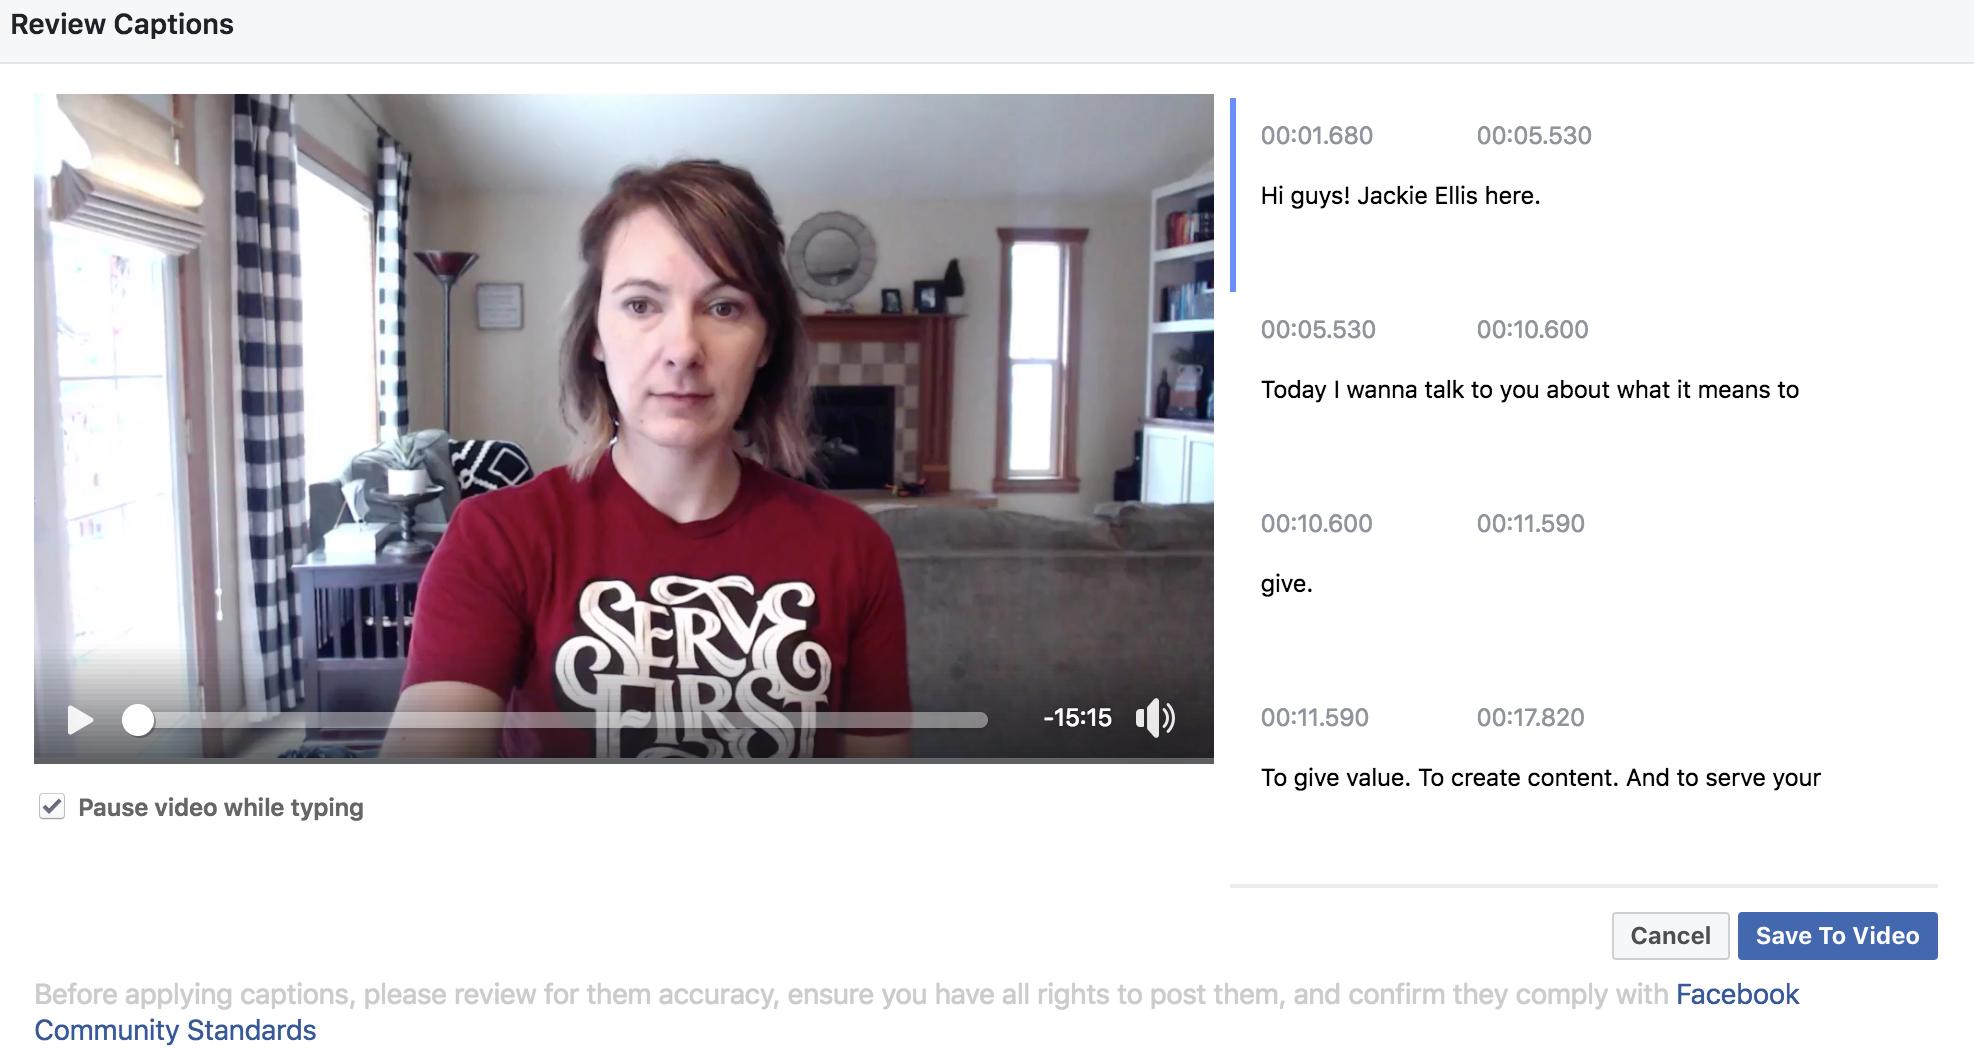 jackie ellis facebook live video generate captions